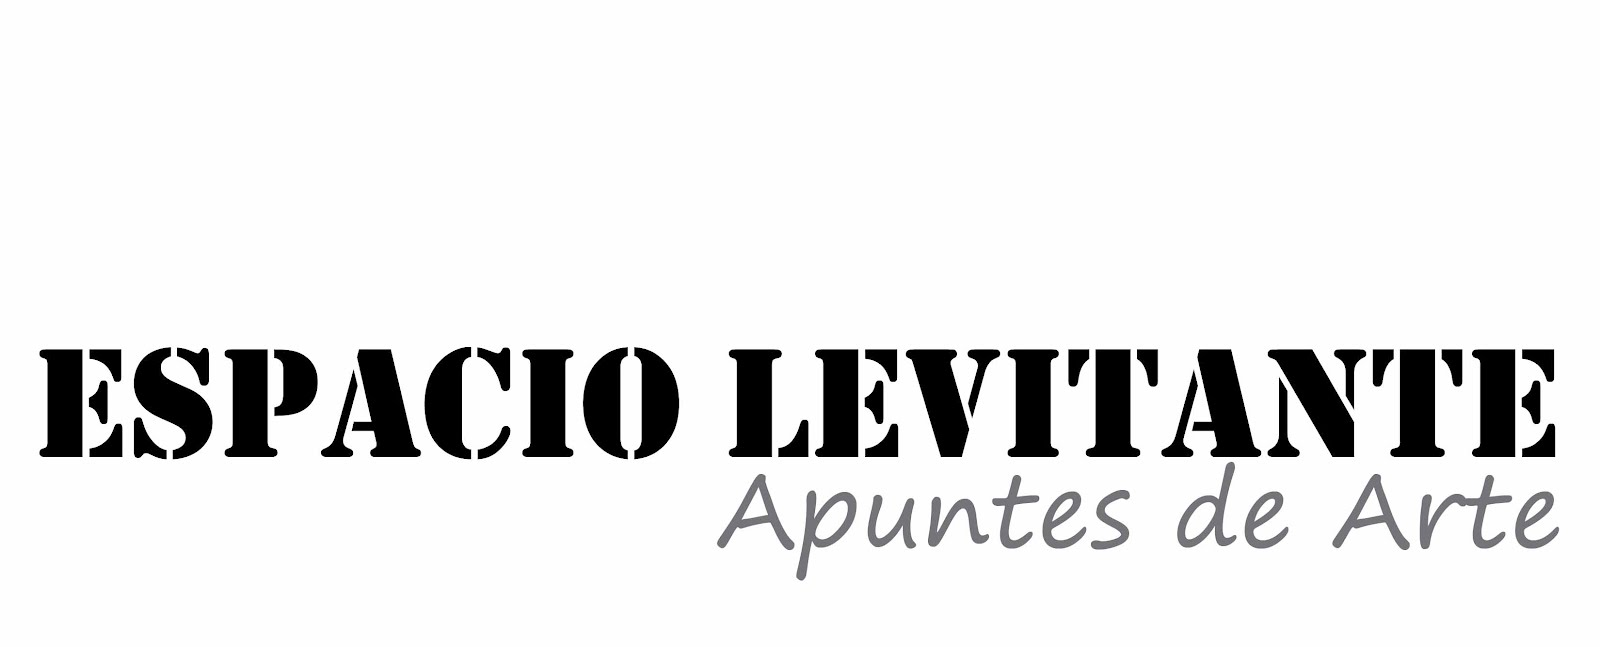 ESPACIO LEVITANTE